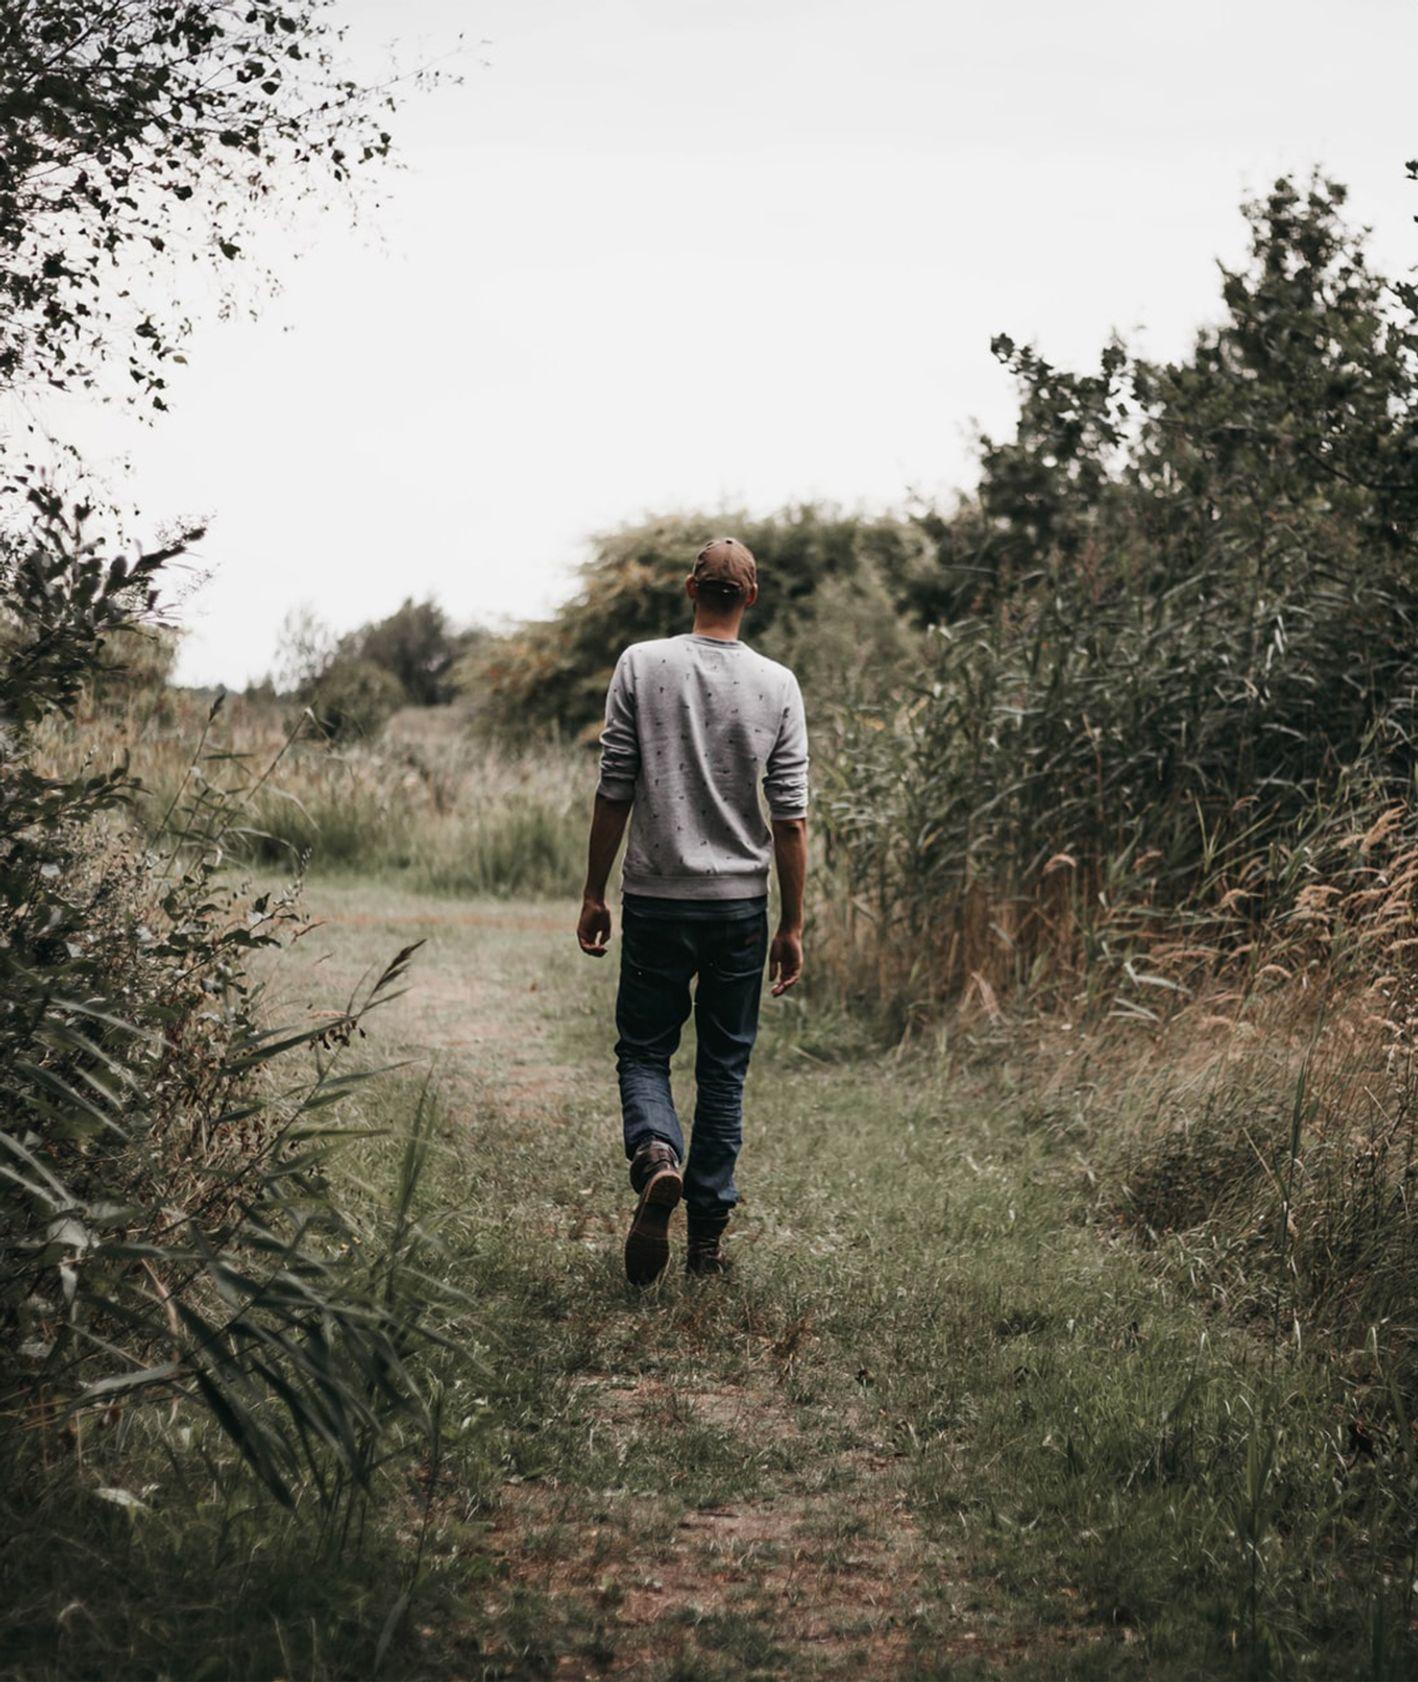 Mężczyzna idący ścieżką między roślinami (fot. Isaac Mehegan / unsplash.com)